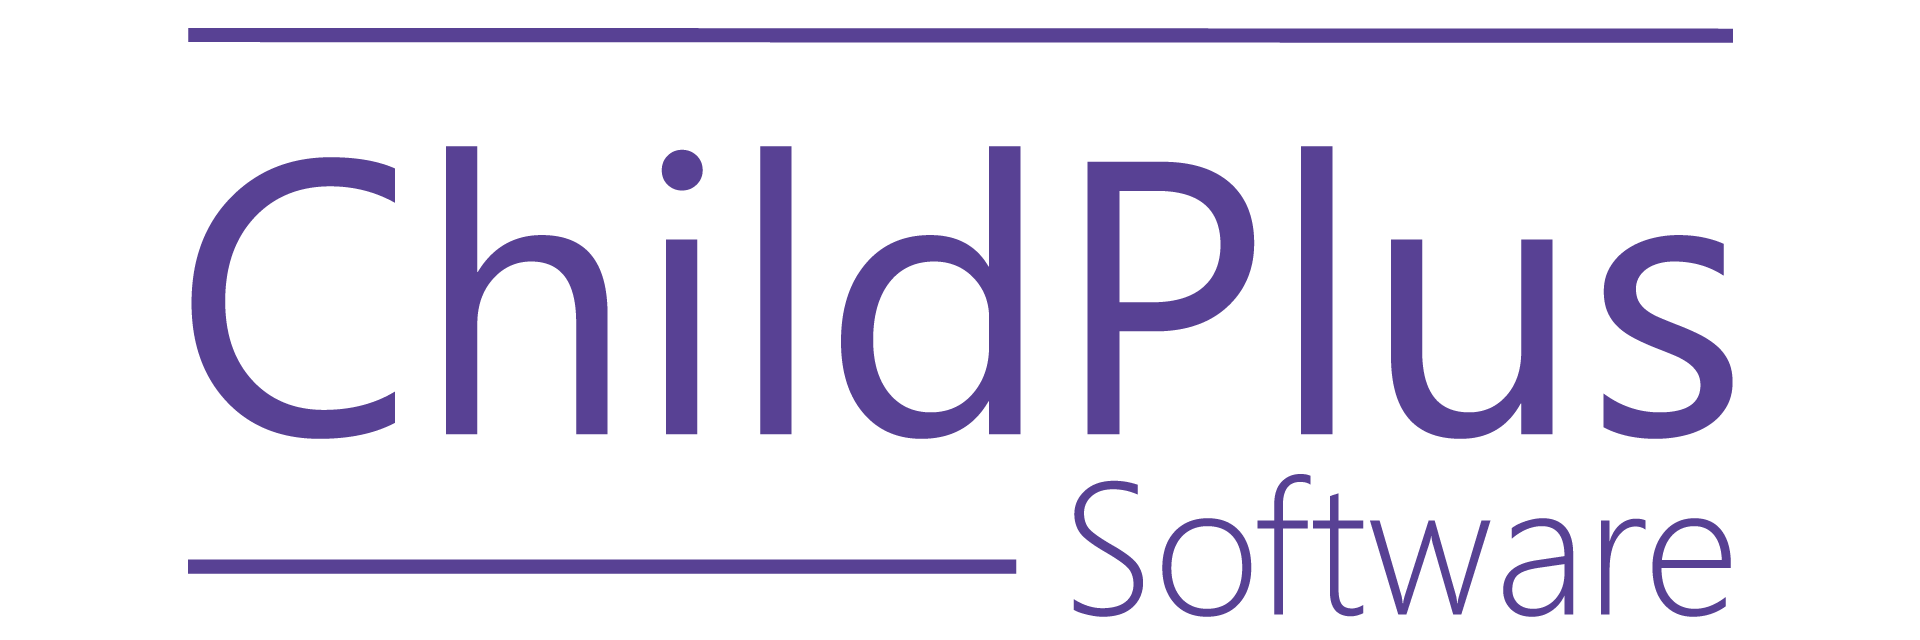 ChildPlus Software Company Logo